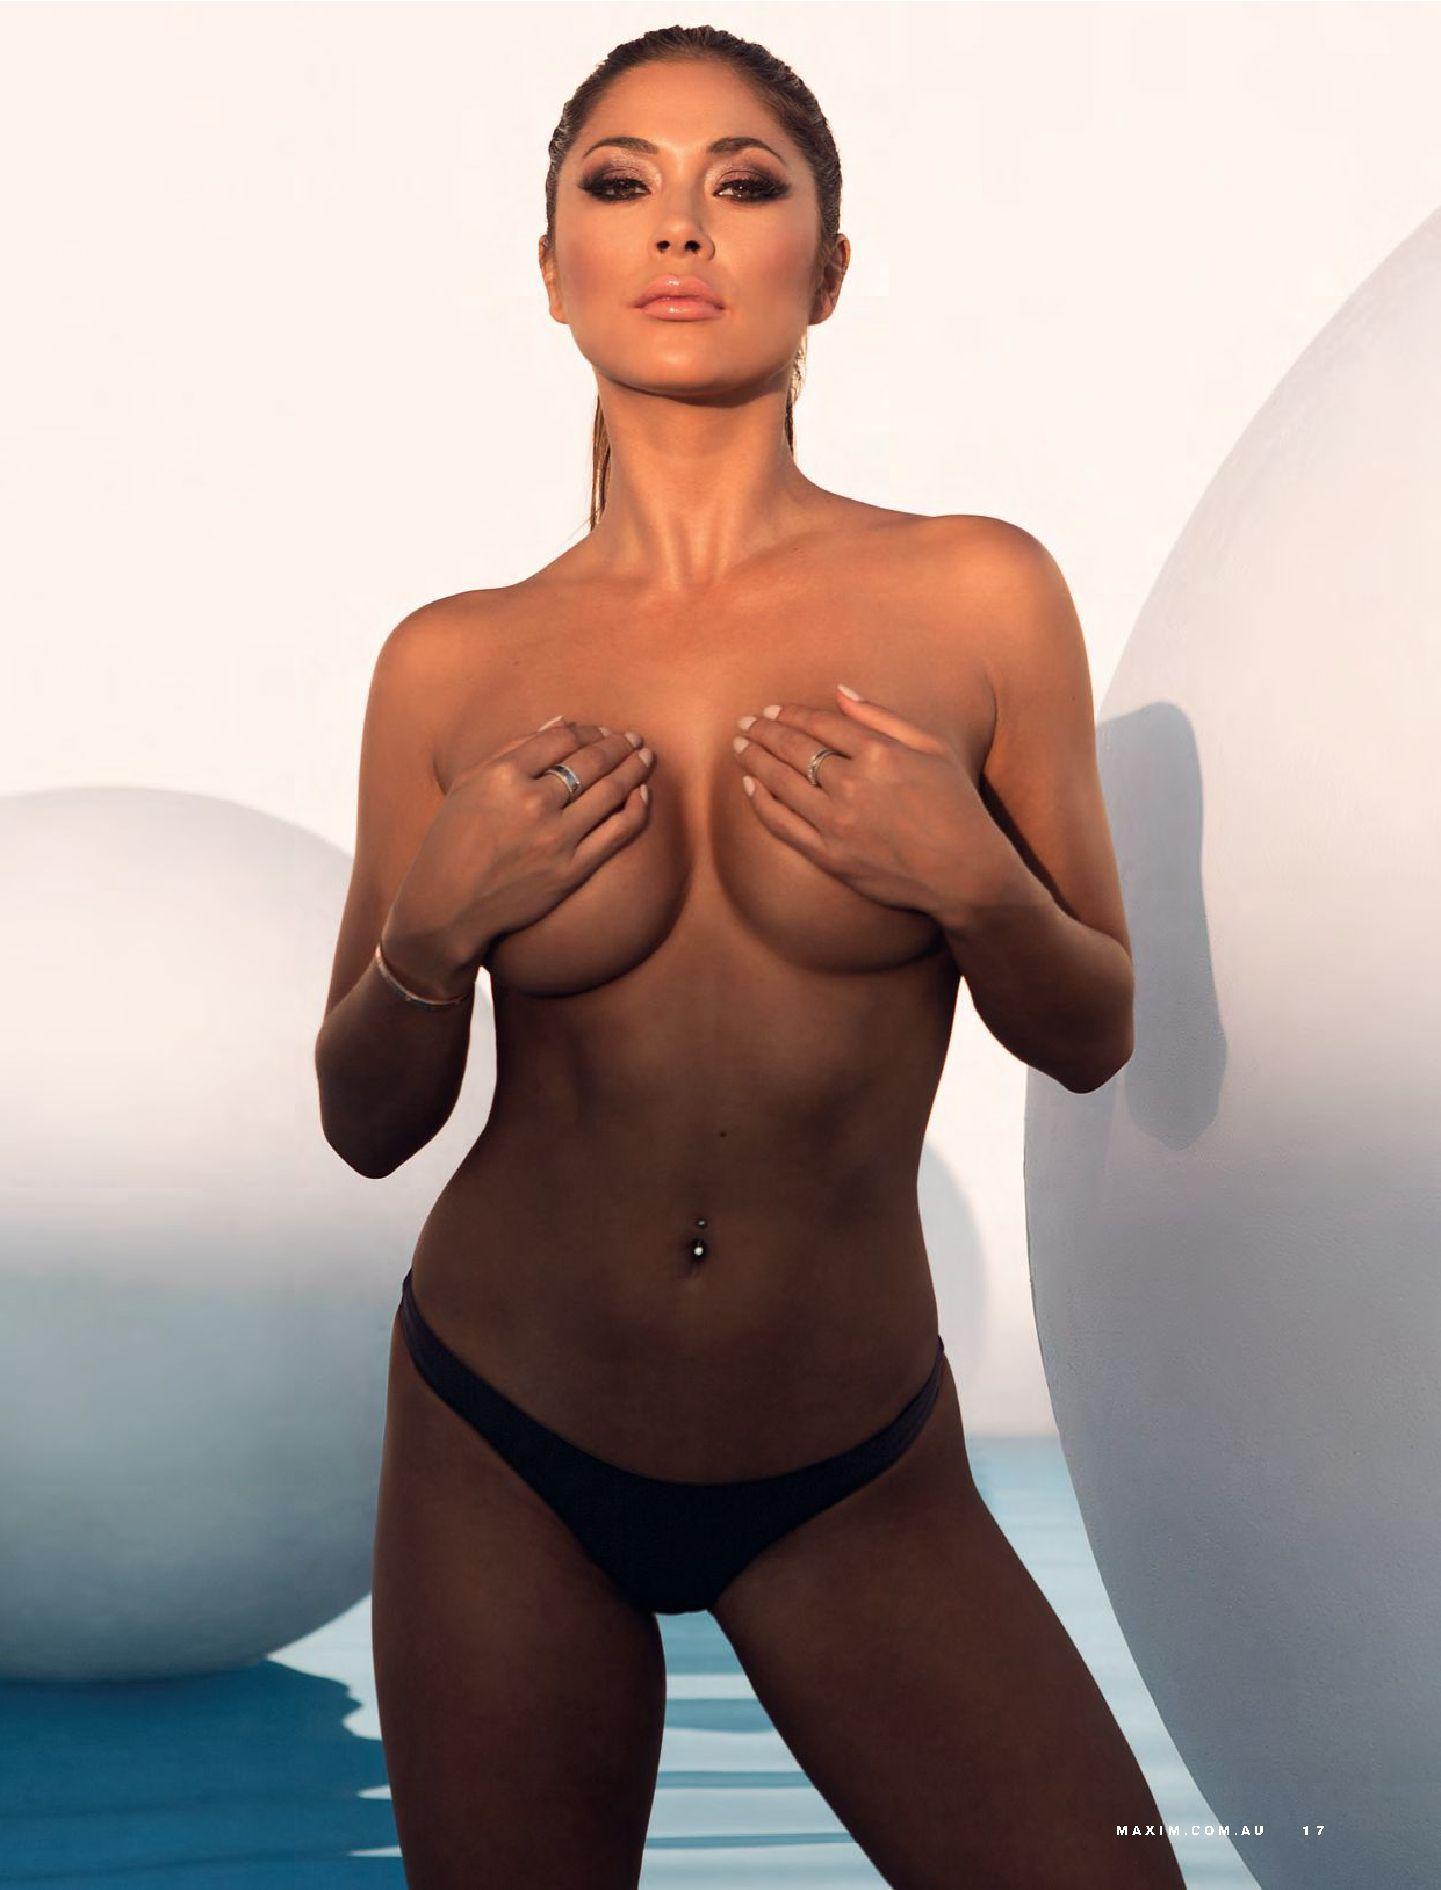 Lani Lane Creampie Good arianny celeste topless handbra   handbra   pinterest